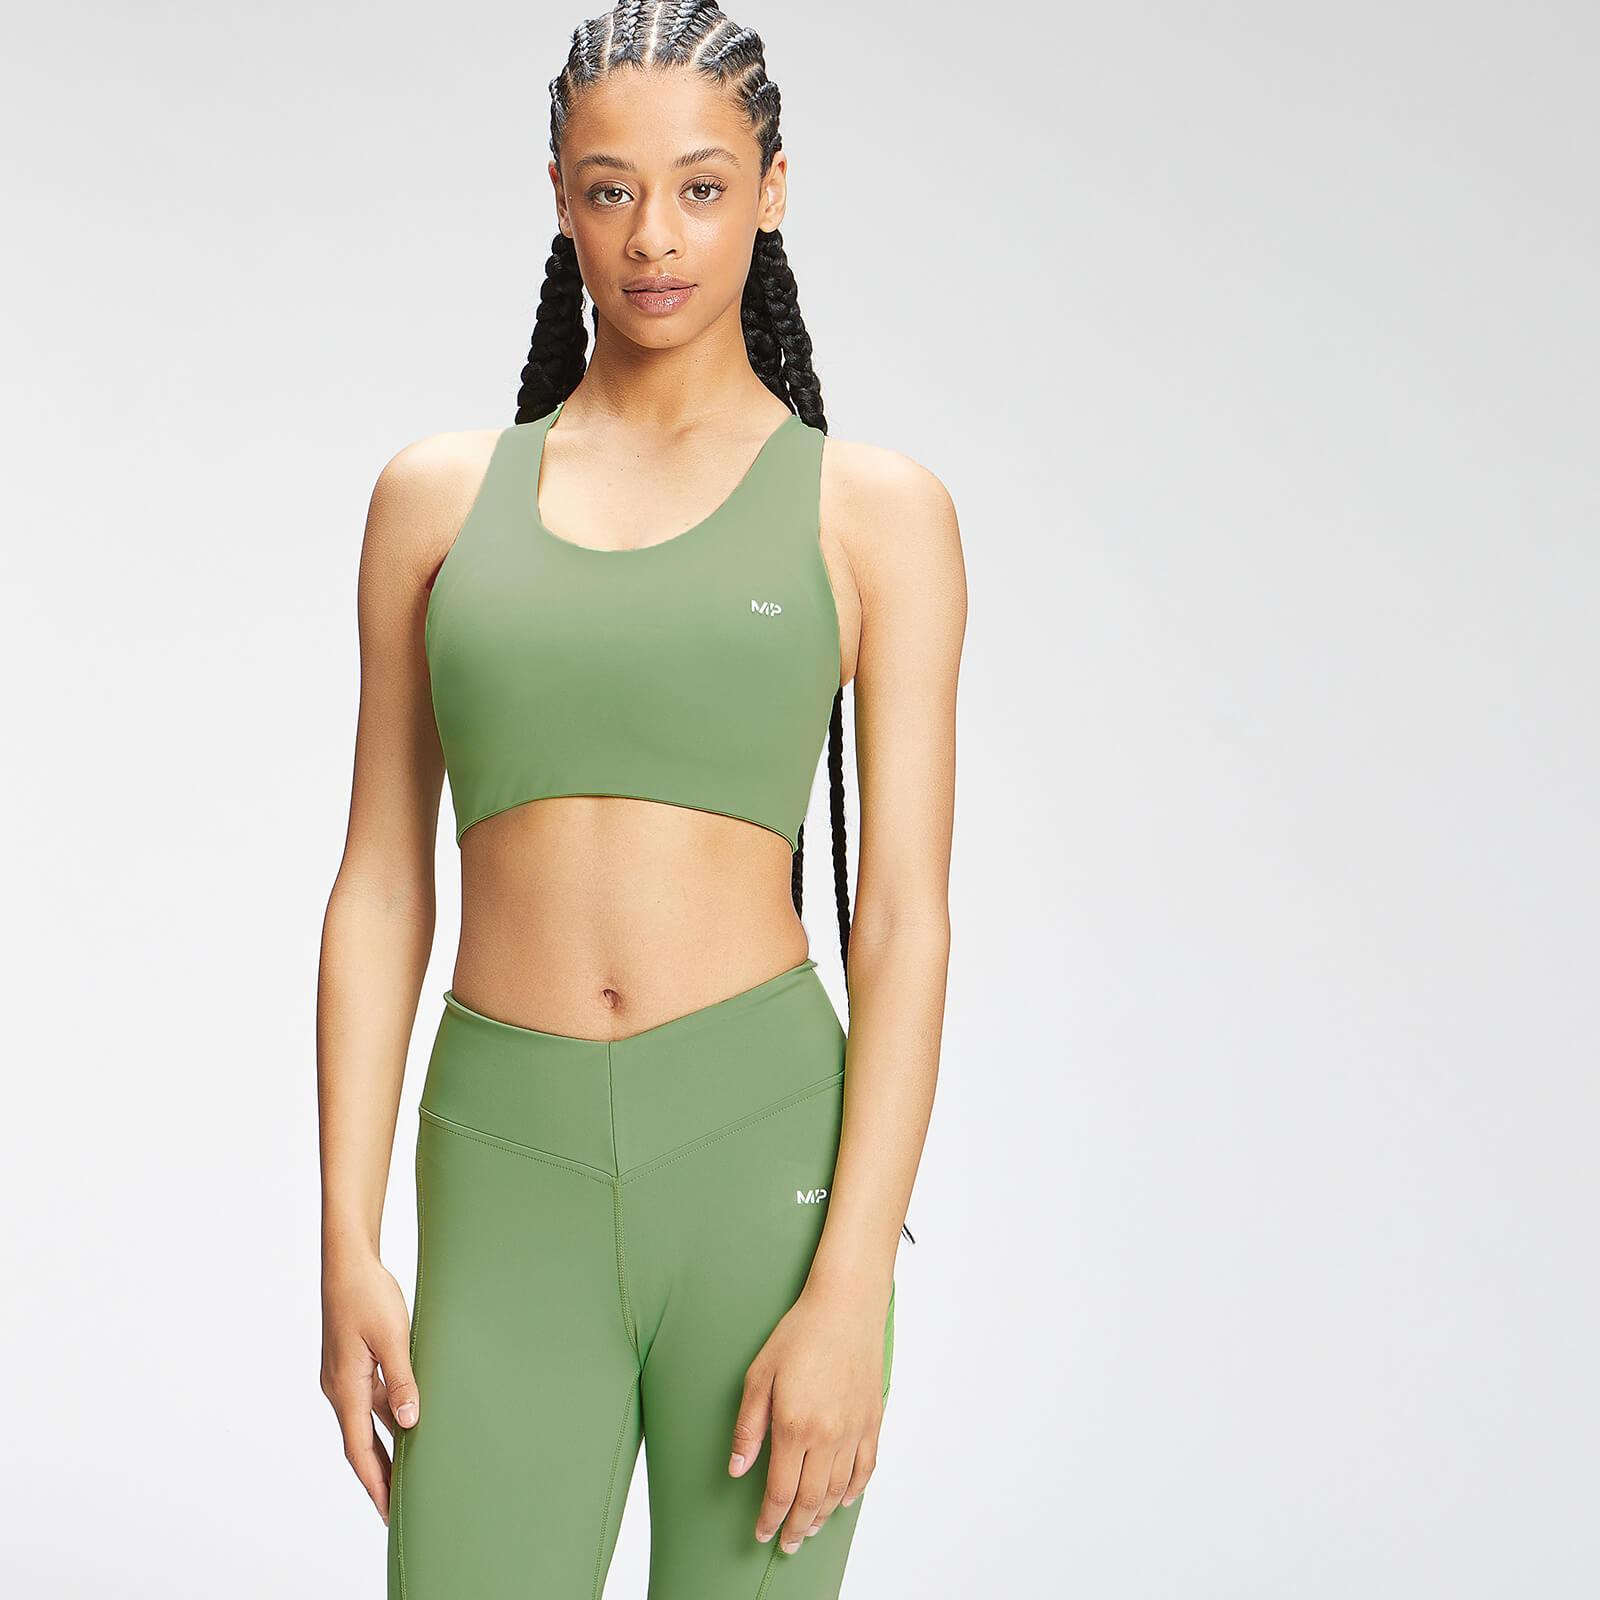 MP Women's Tempo Cross Back Sports Bra - Apple Green - L, Myprotein International  - купить со скидкой